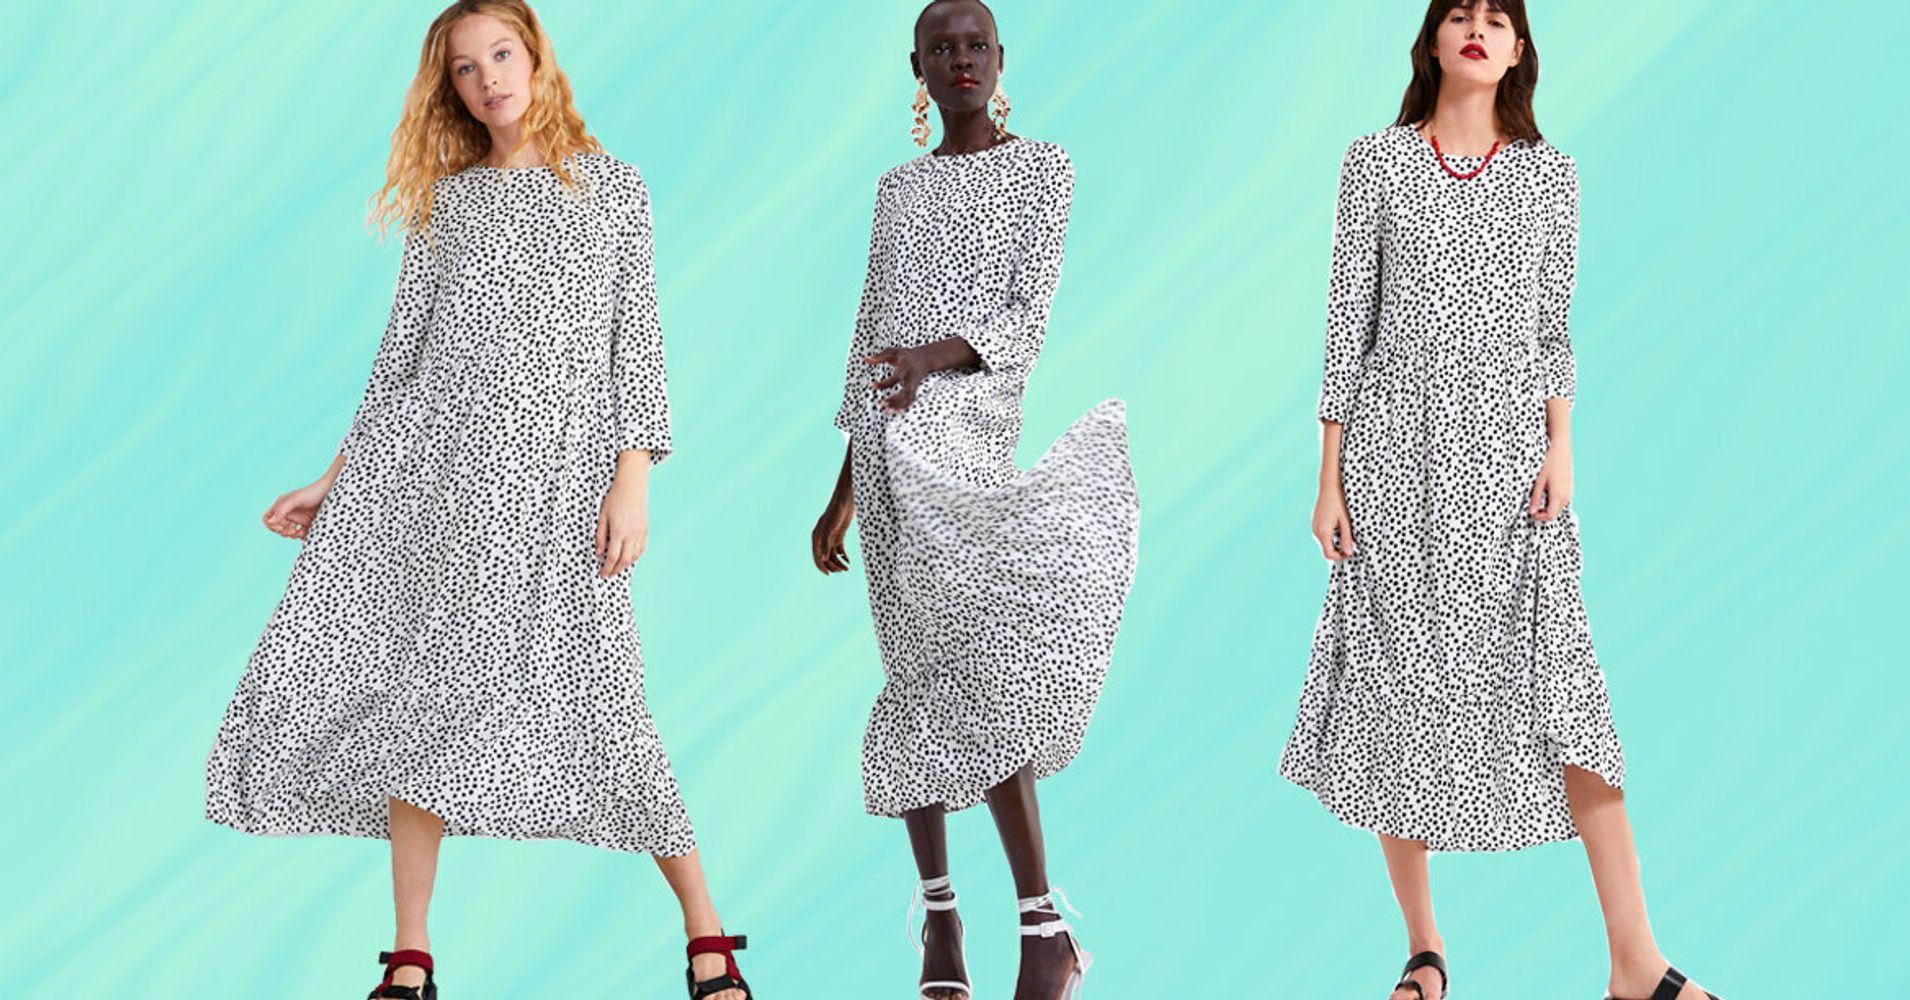 71cf9c9c7c Love That Polka-Dot Zara Dress? Here Are 9 Drop Hem Alternatives To Buy